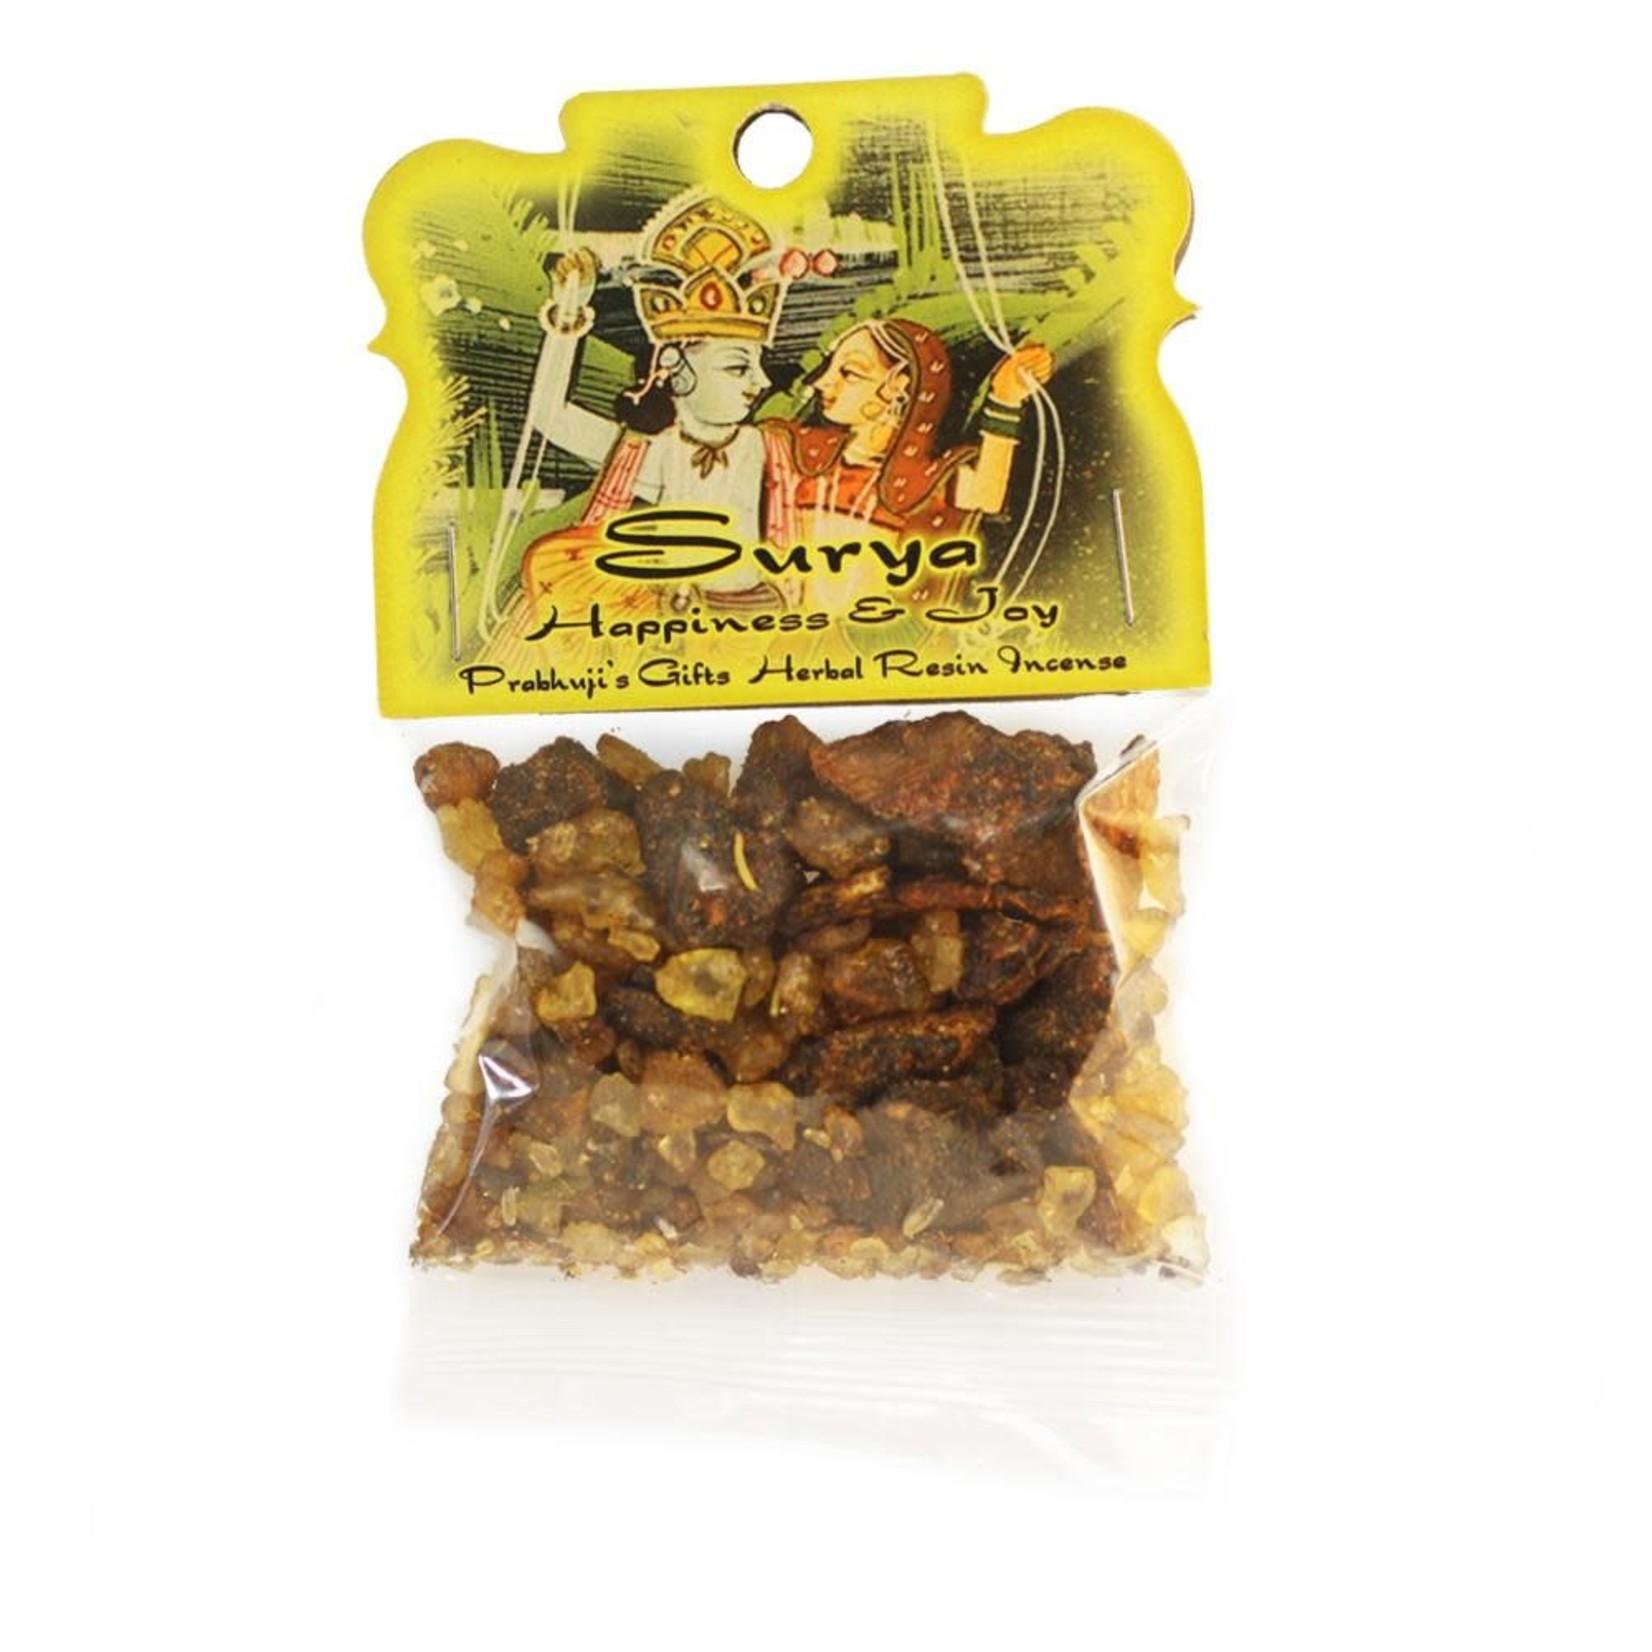 Prabhujis Gifts Surya - Happiness and Joy Resin Incense